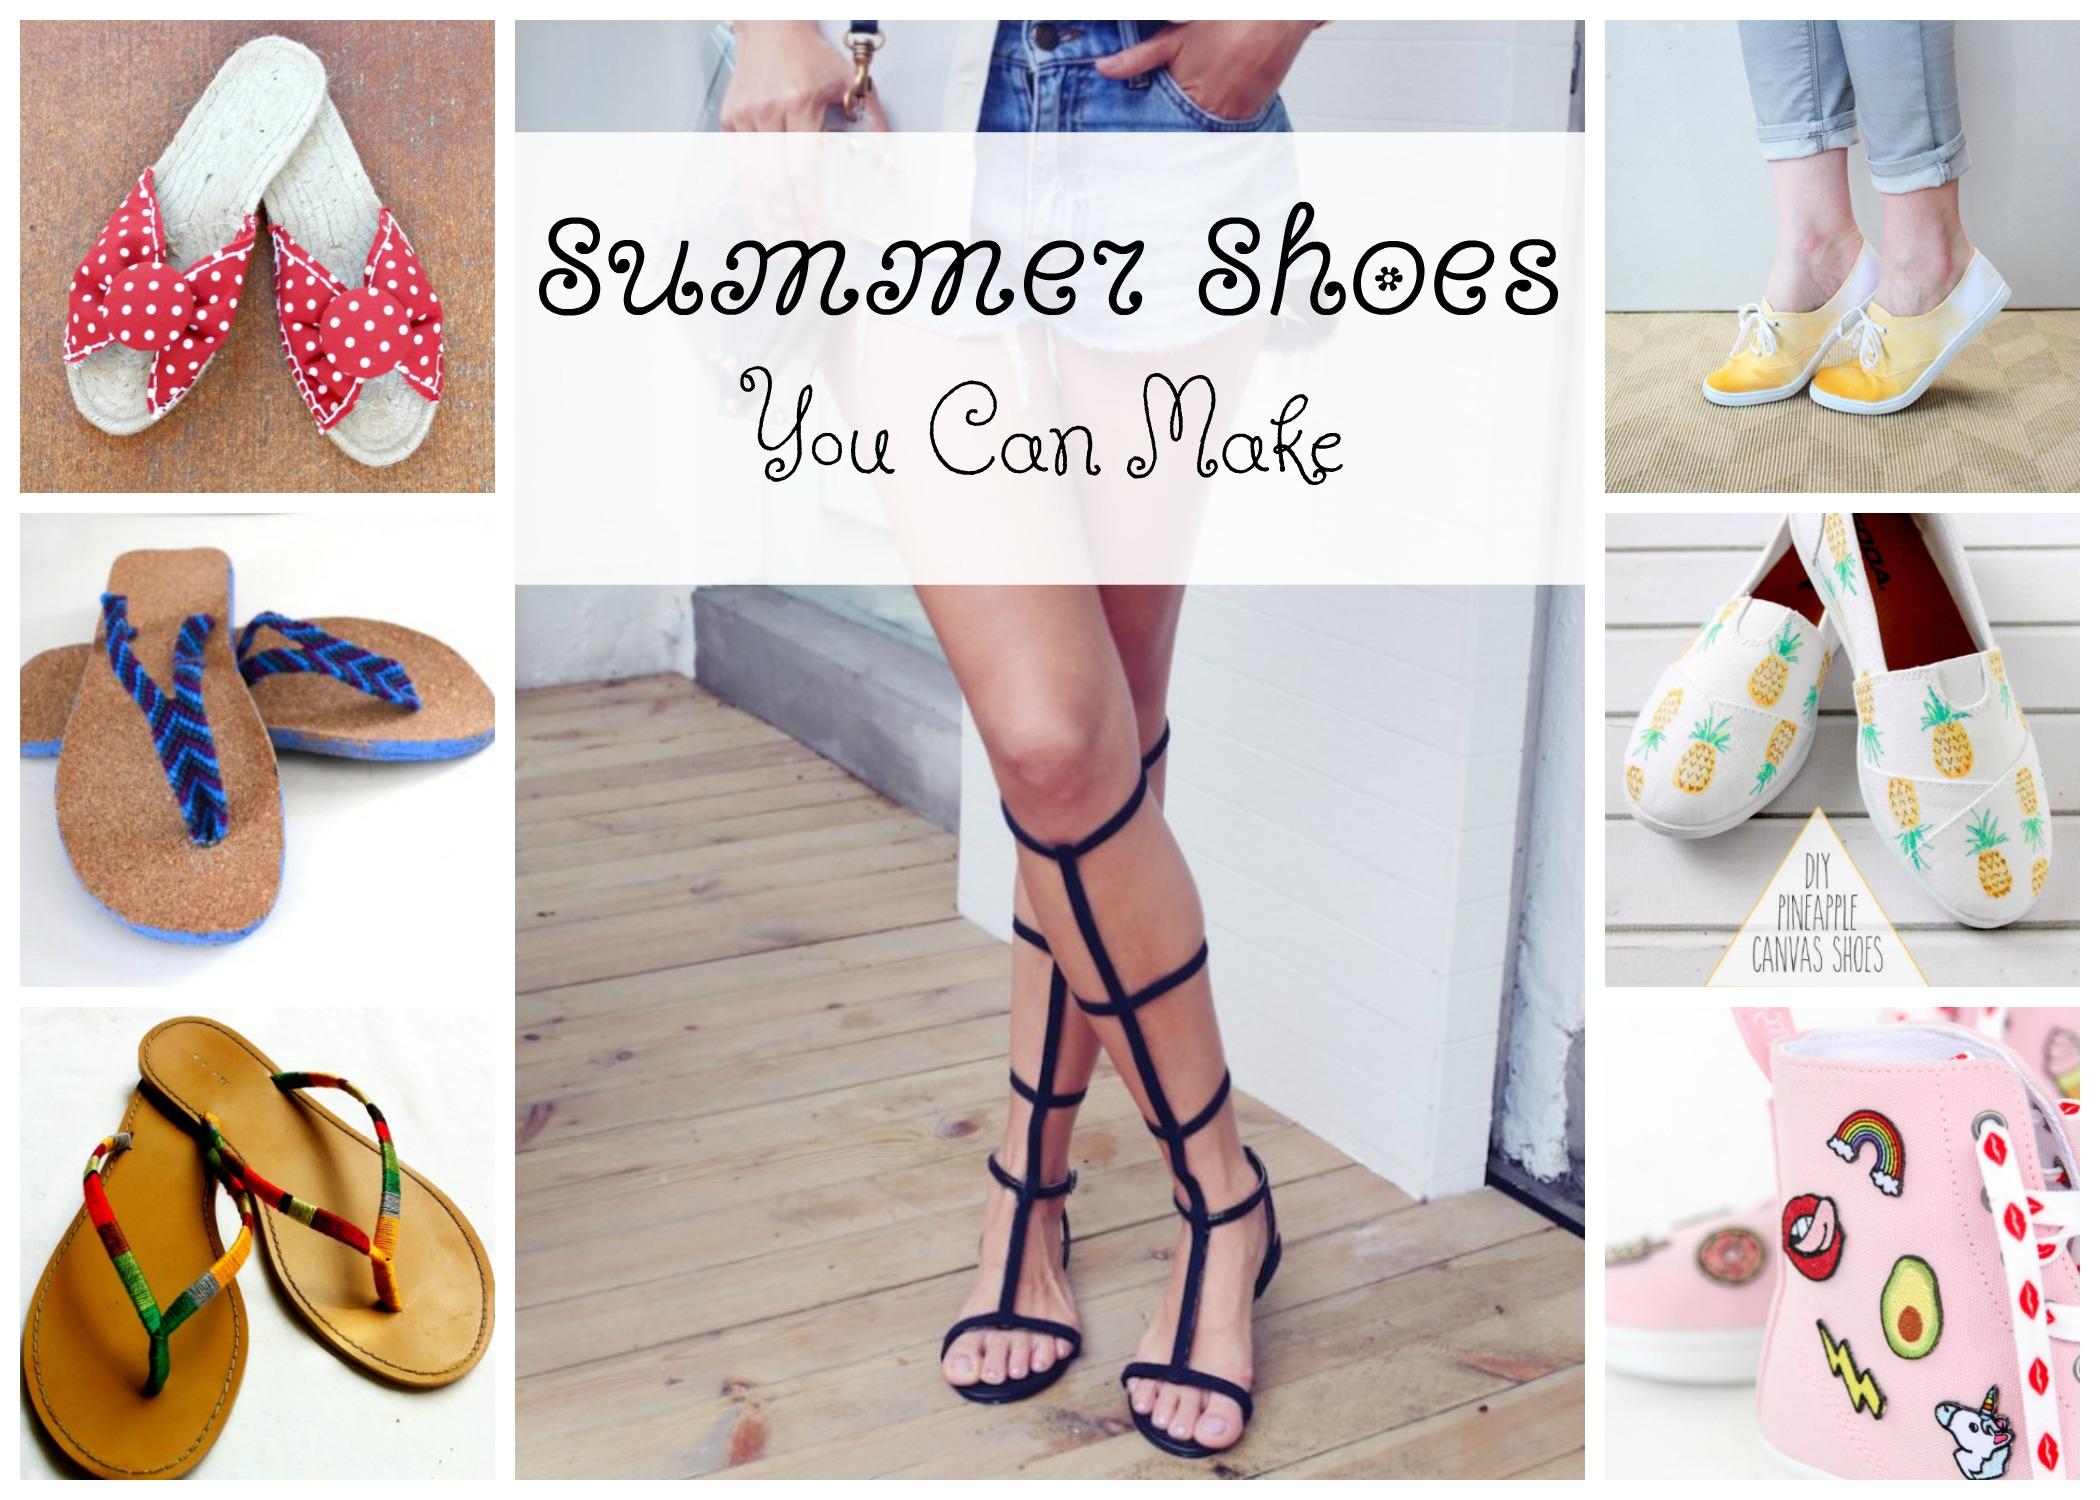 c429e36e877 Summer Shoes That You Can Make - Fairfield World Blog